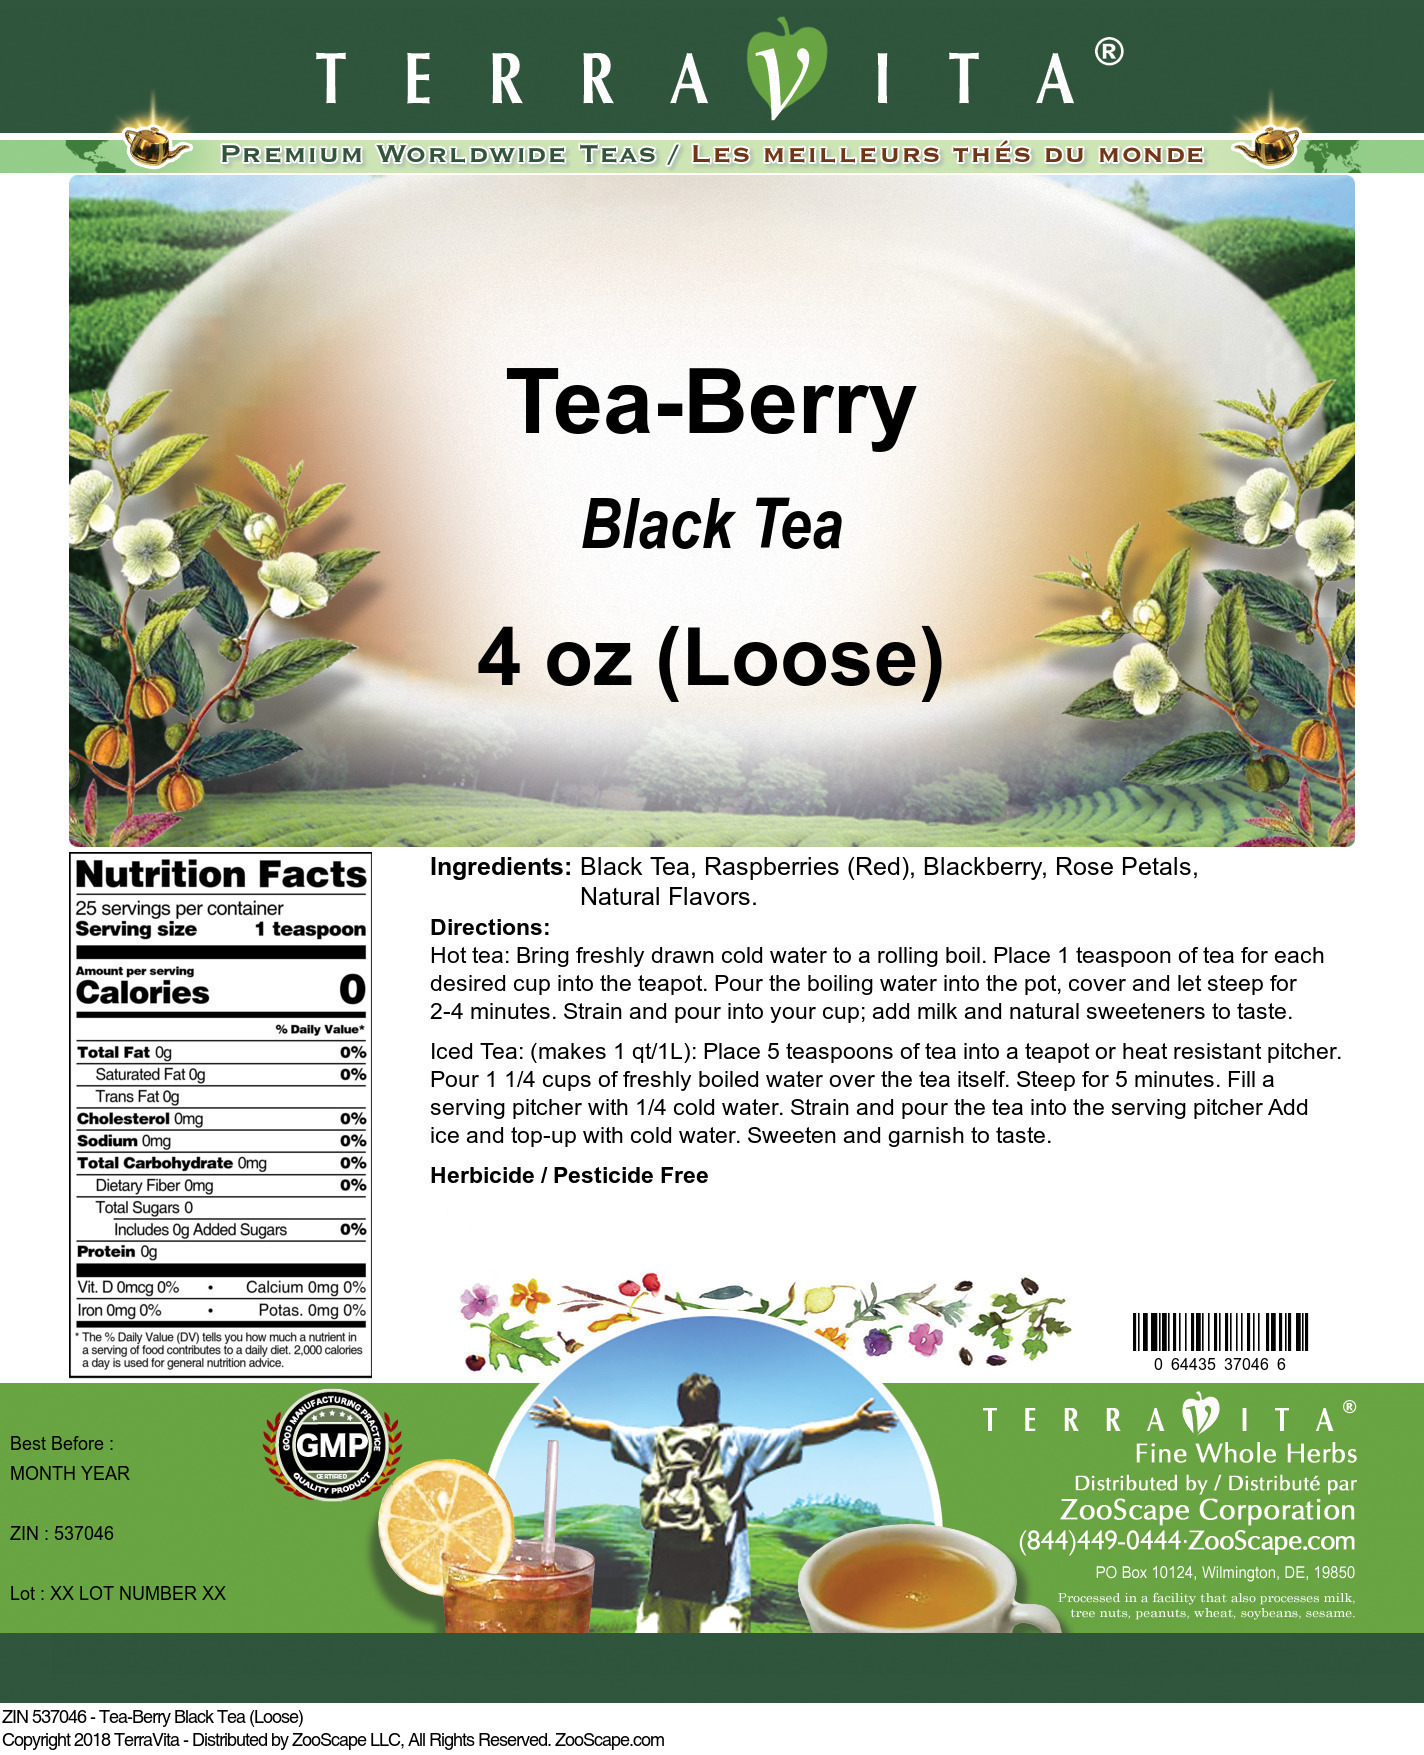 Tea-Berry Black Tea (Loose)